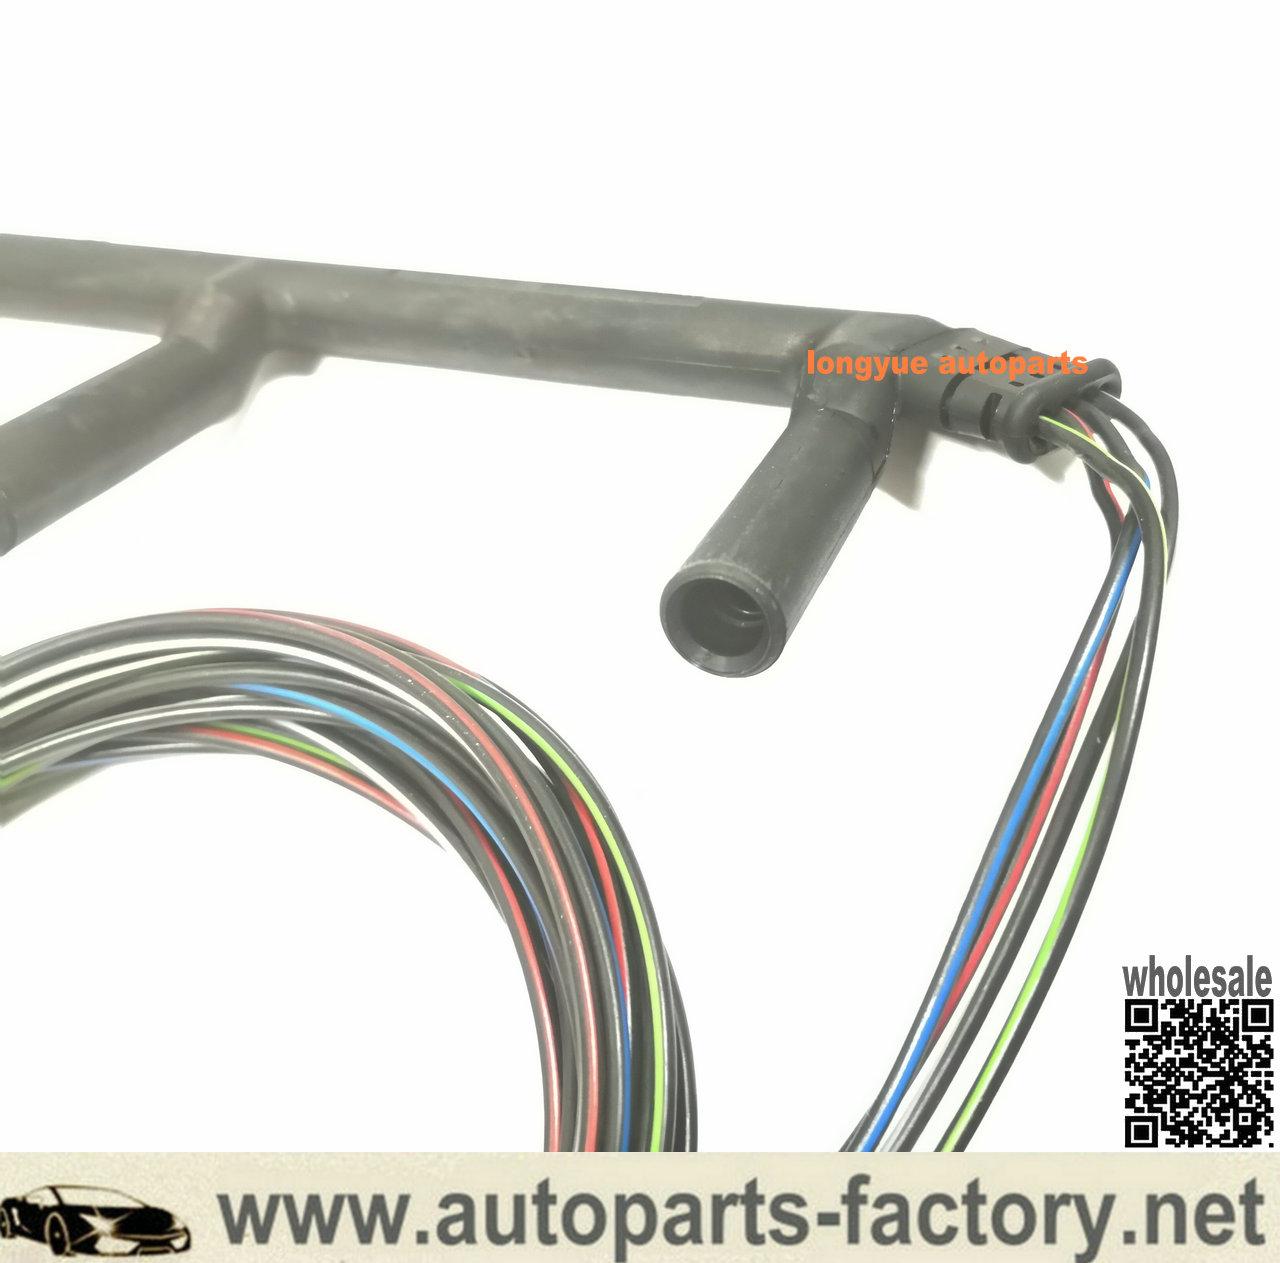 Volkswagen  Audi Diesel Glow Plug Harness  A4 Bew  A5 Brm